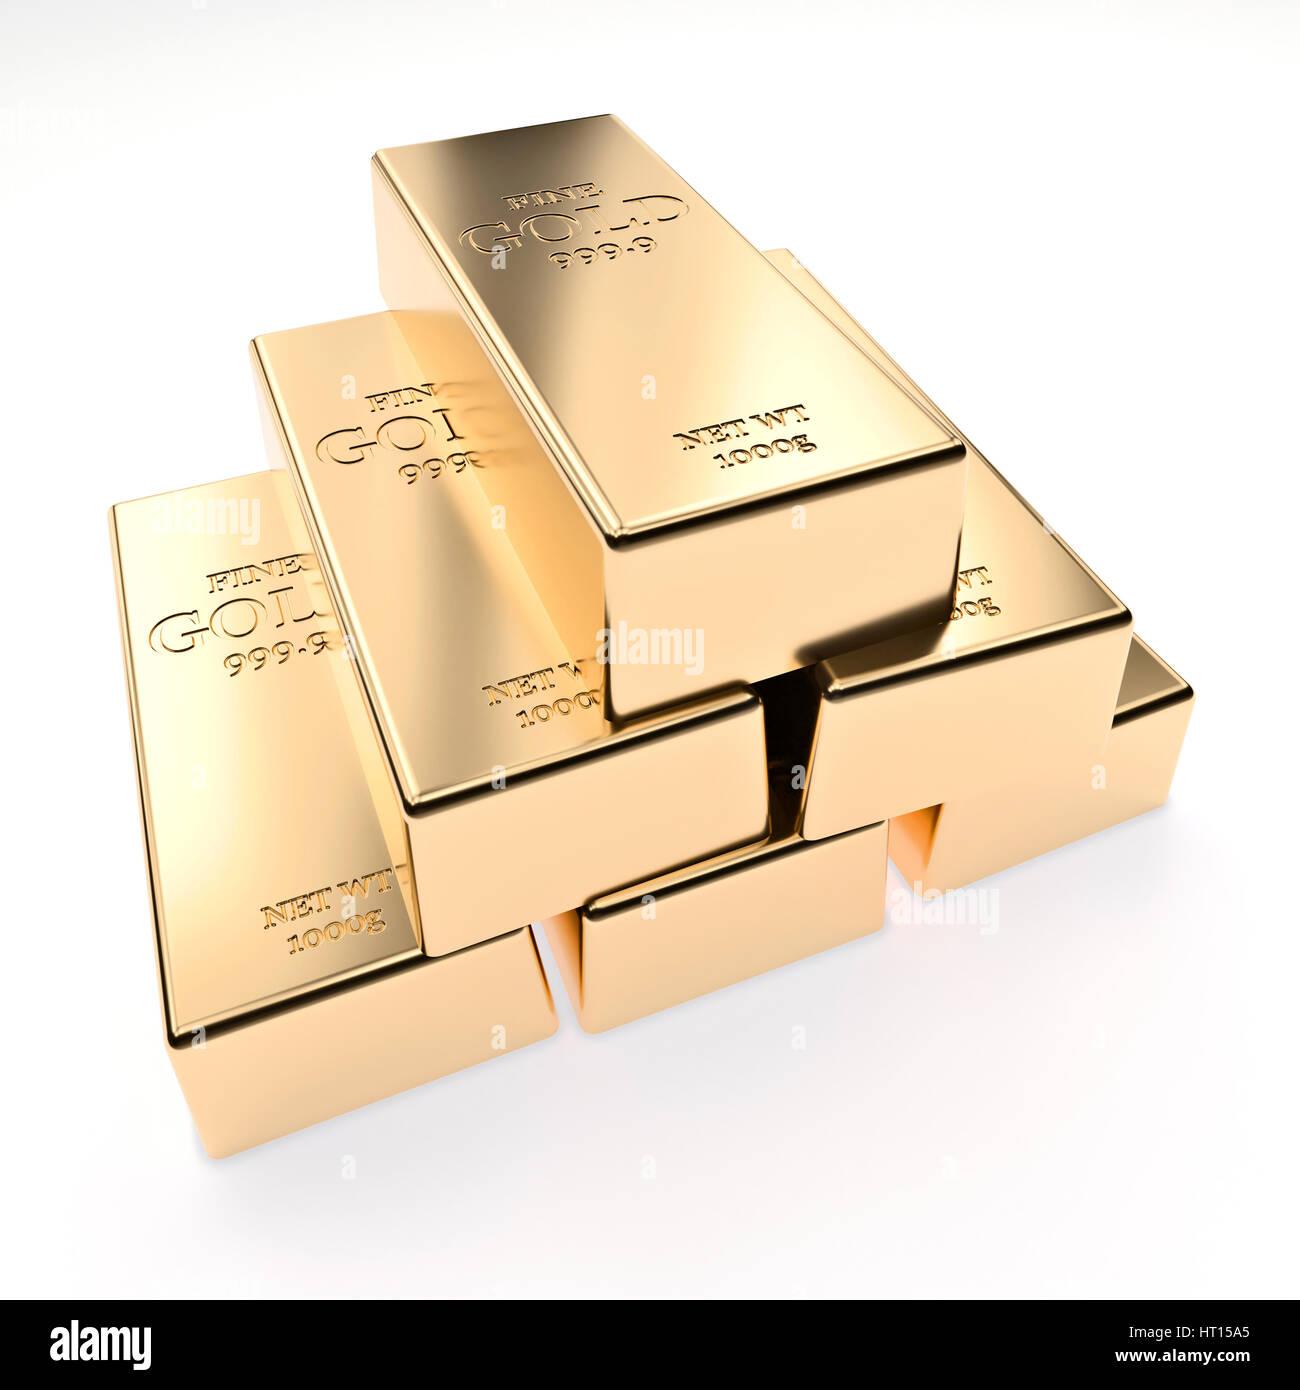 classic gold ingot 3d rendering image - Stock Image